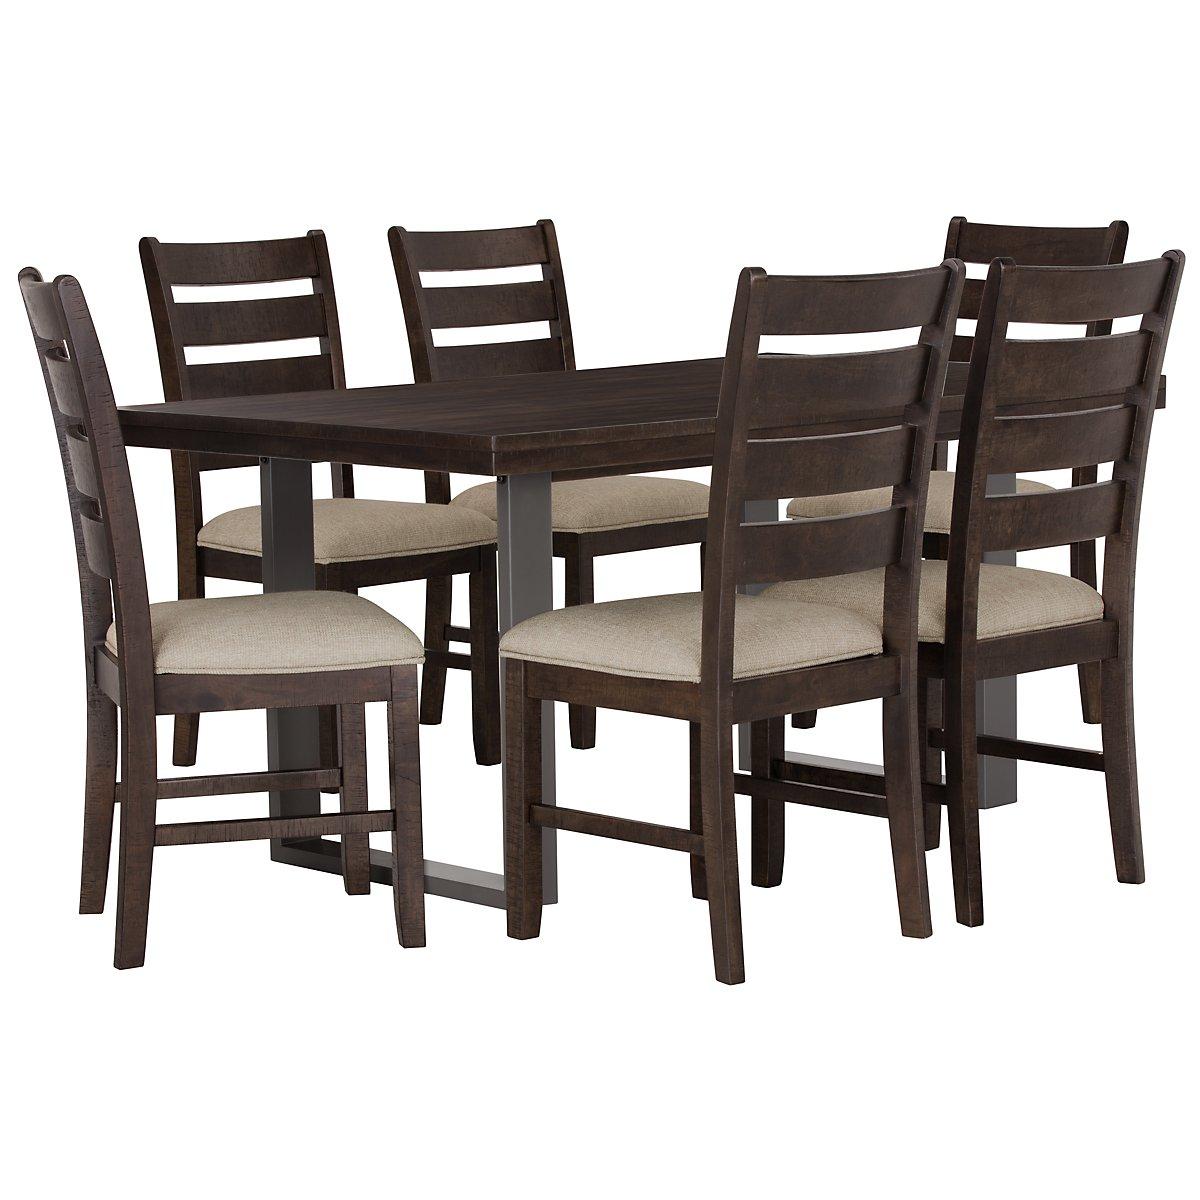 Sawyer Dark Tone Rectangular Table & 4 Wood Chairs